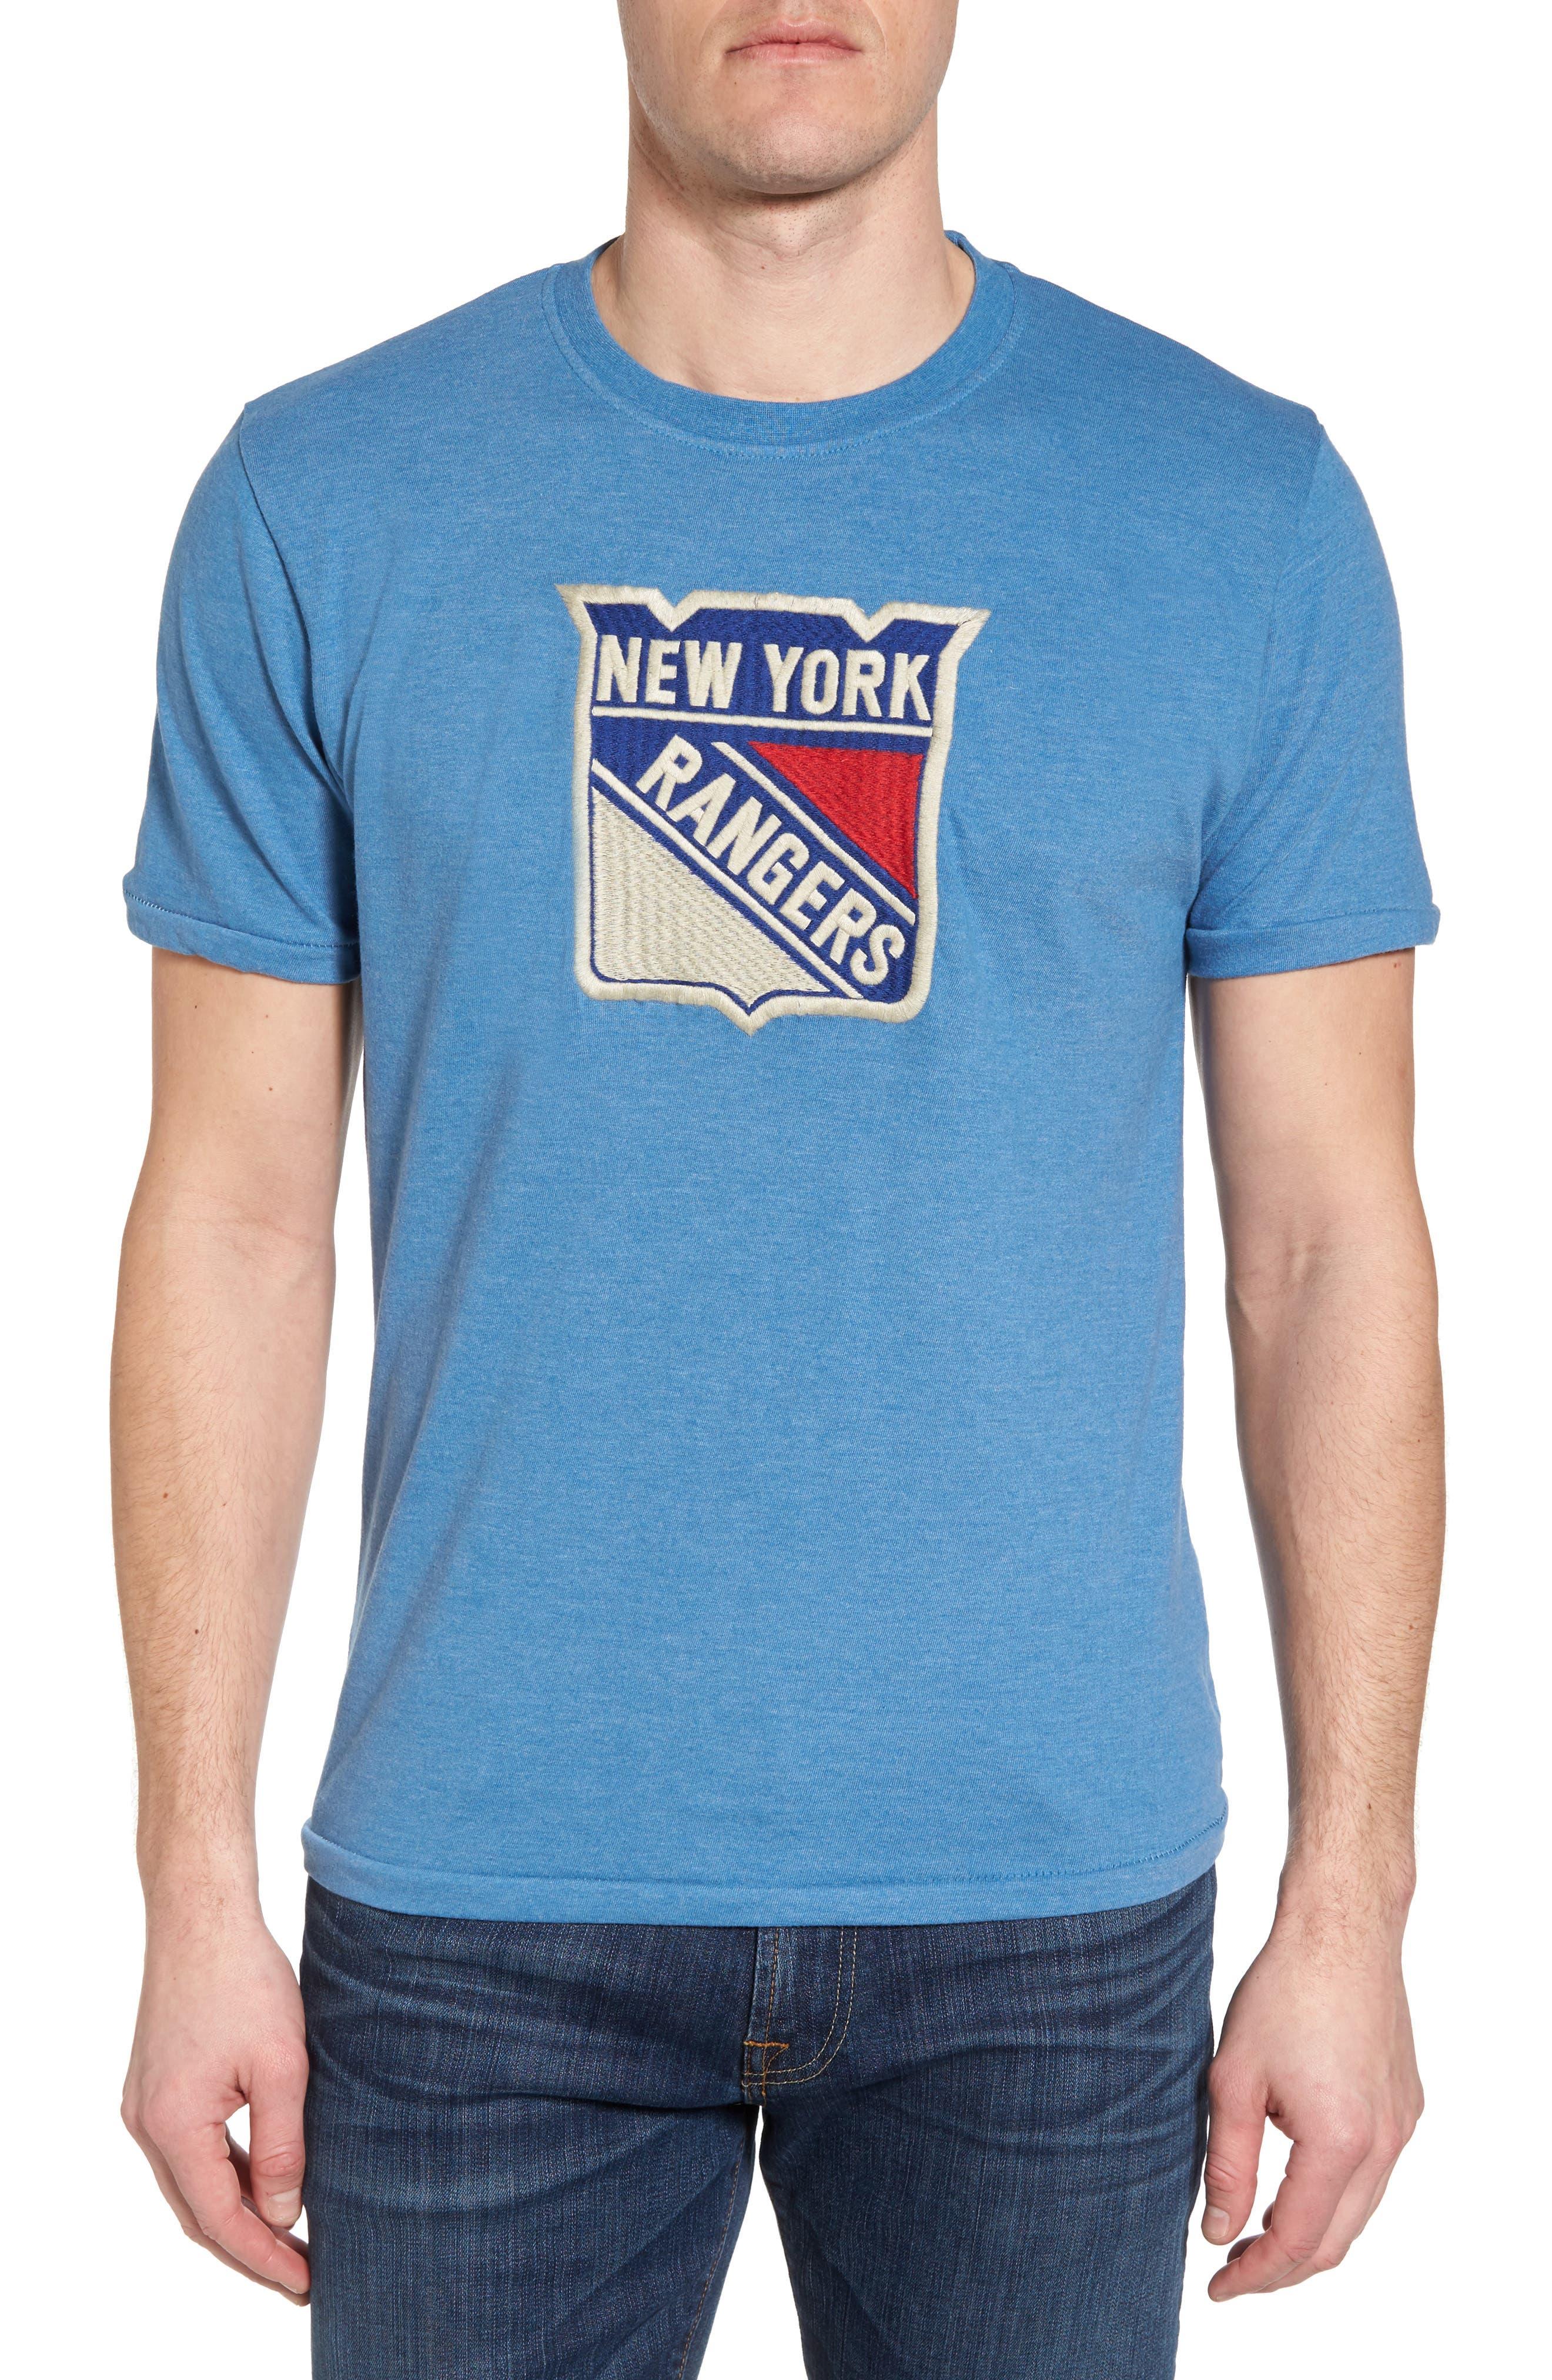 American Needle Hillwood New York Rangers T-Shirt